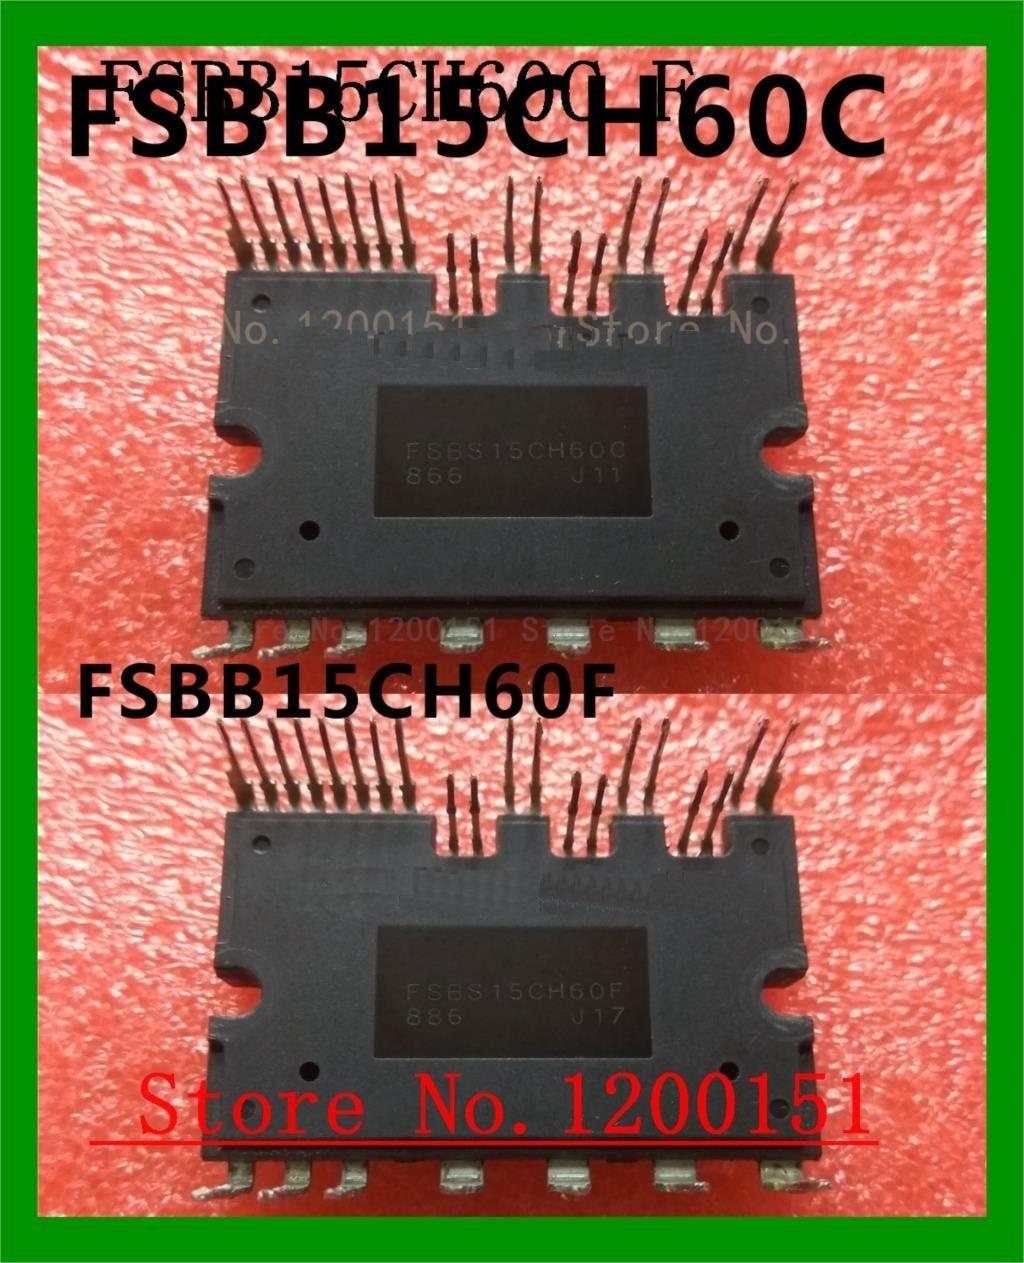 Box of 200 Aluminum Universal Clips for Trespa Pura NFC Flush Siding 500271